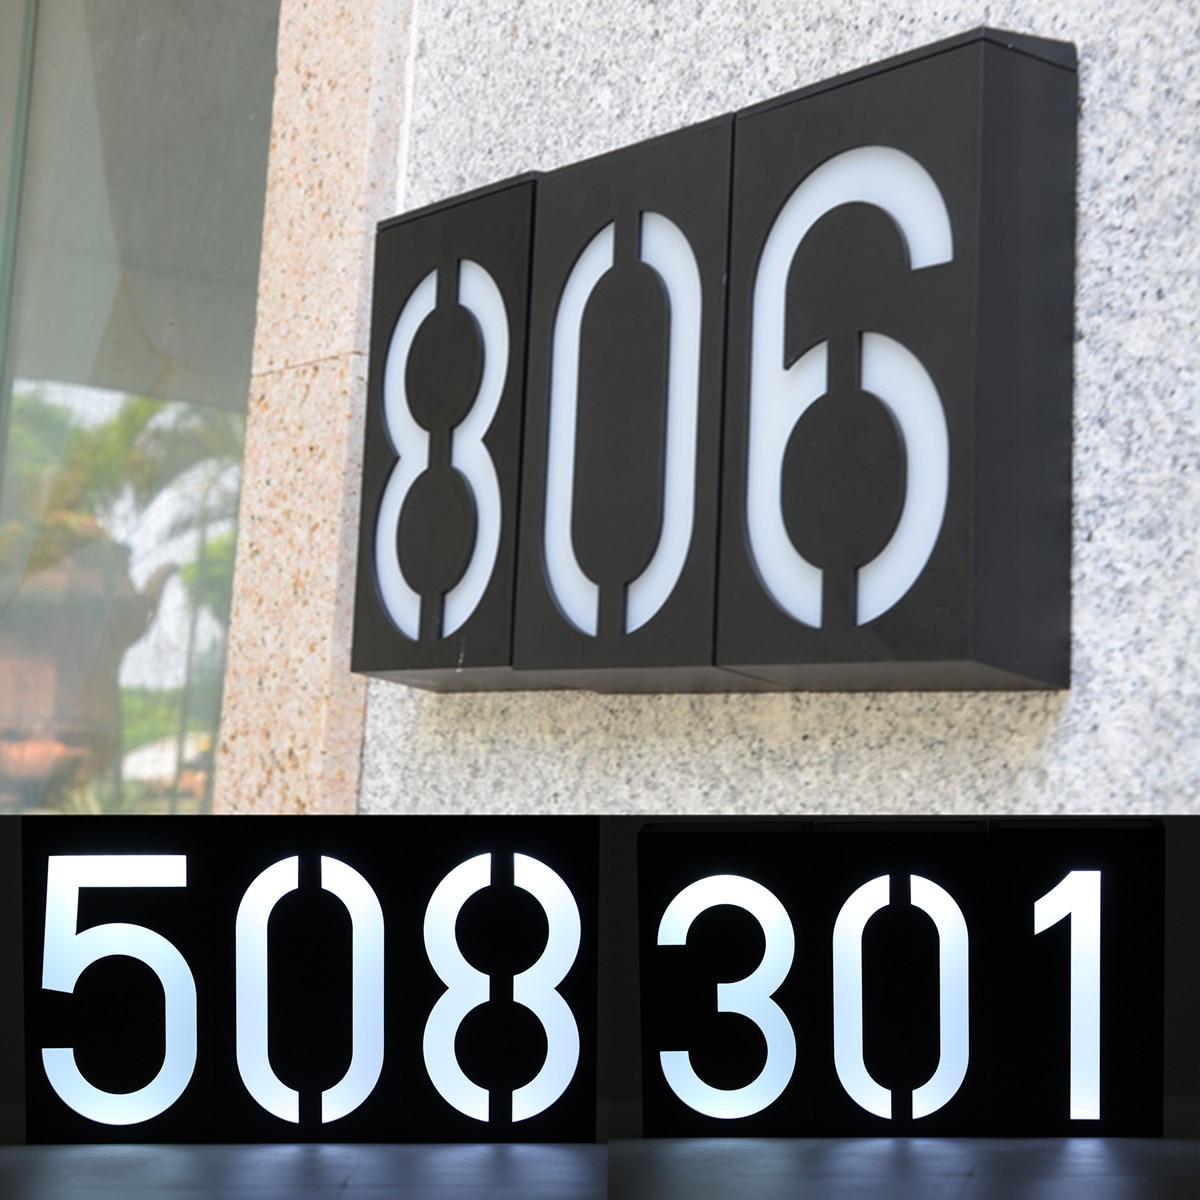 Solar Power 6 LED Number Light Sign House Hotel Door Address Plaque Digit Plate Tool Waterproof Wall Light Sunlight Lamp